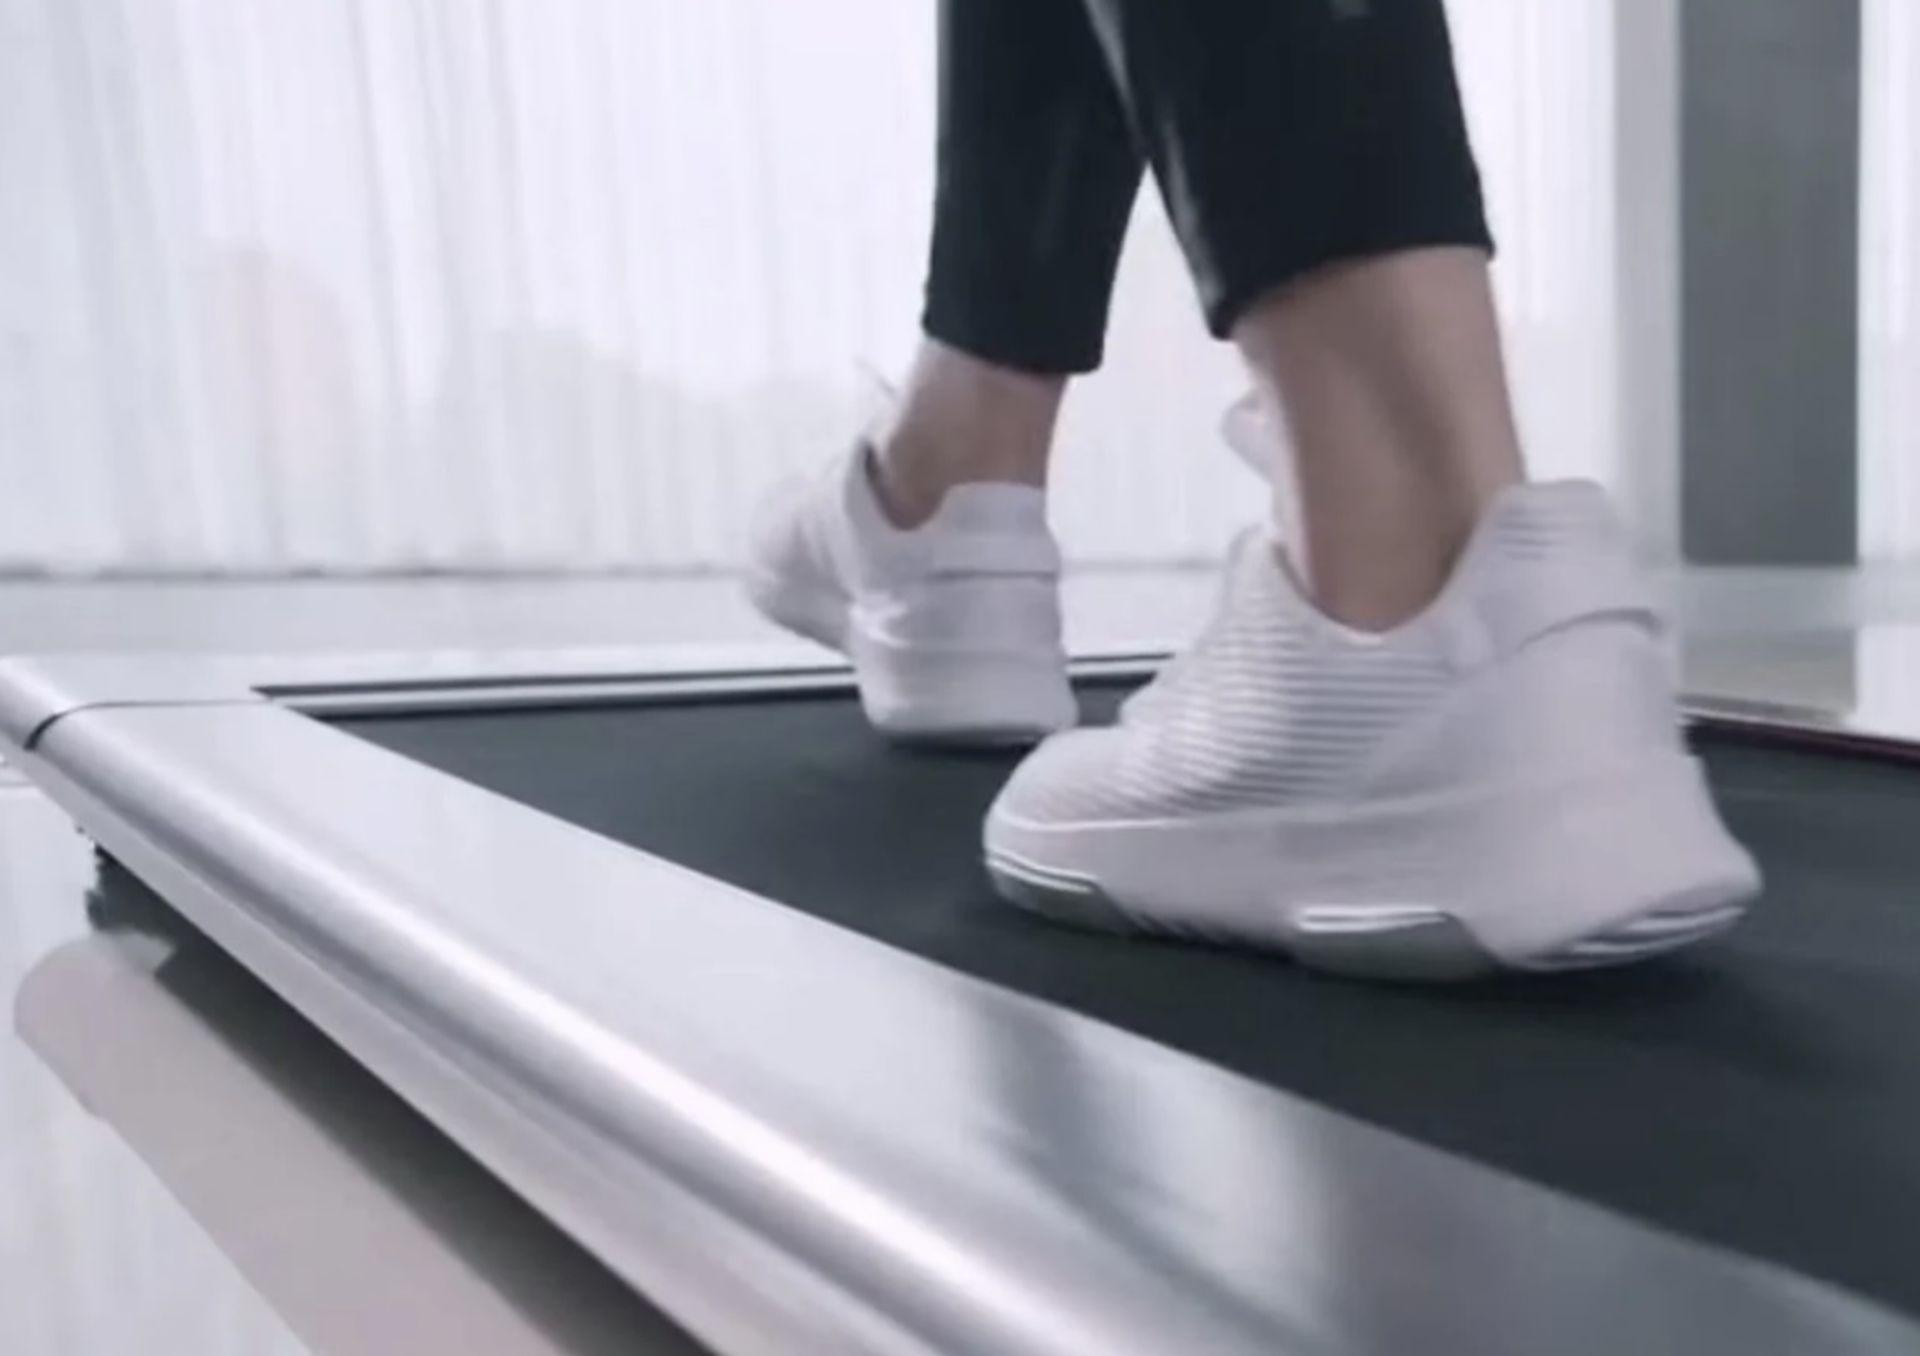 1 x Slim Tread Ultra Thin Smart Treadmill Running / Walking Machine - Lightweight With Folding - Image 15 of 23